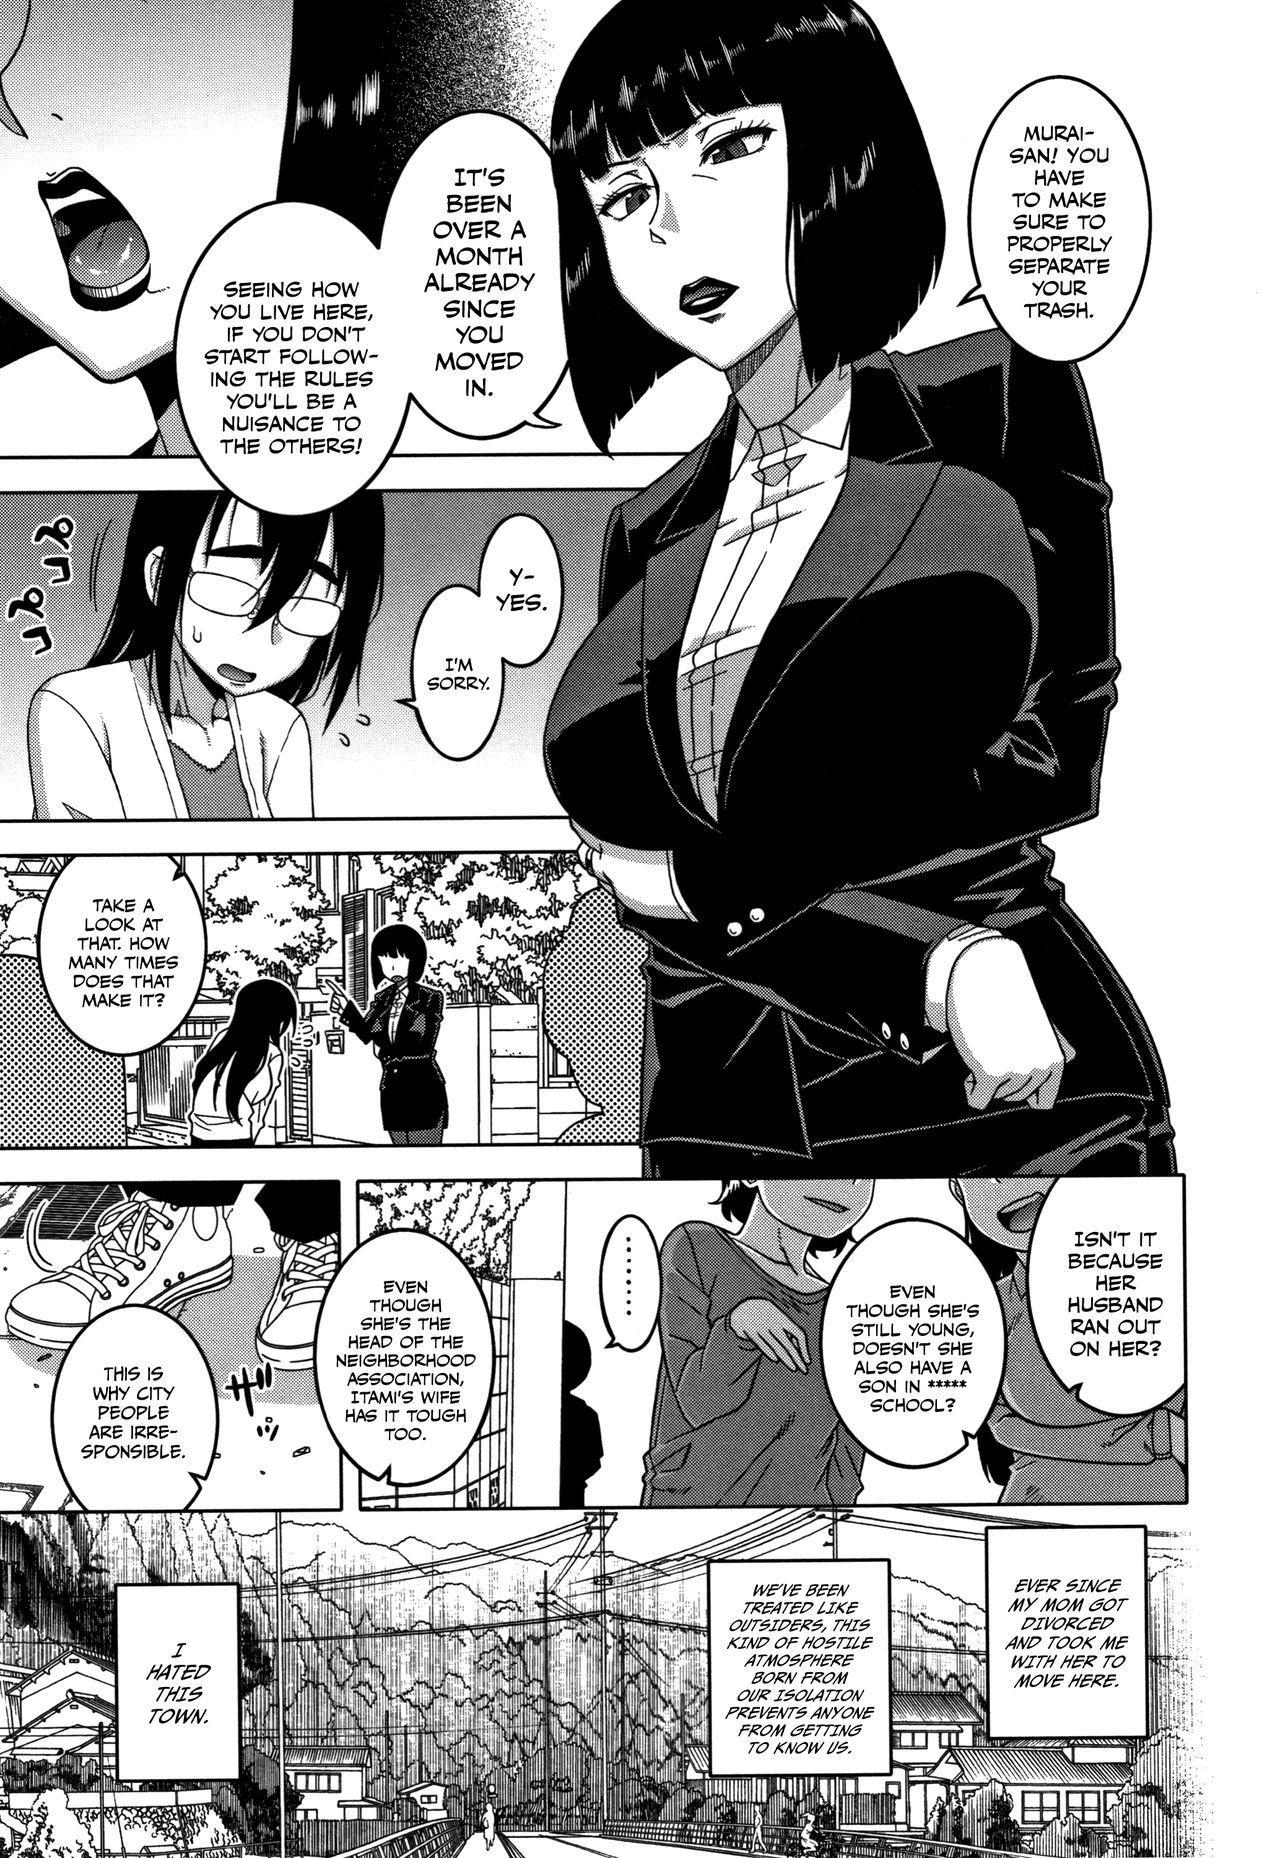 [Takatsu] Kami-sama no Iu Toori   As God Says Ch. 1-2 [English] [Secluded] 0